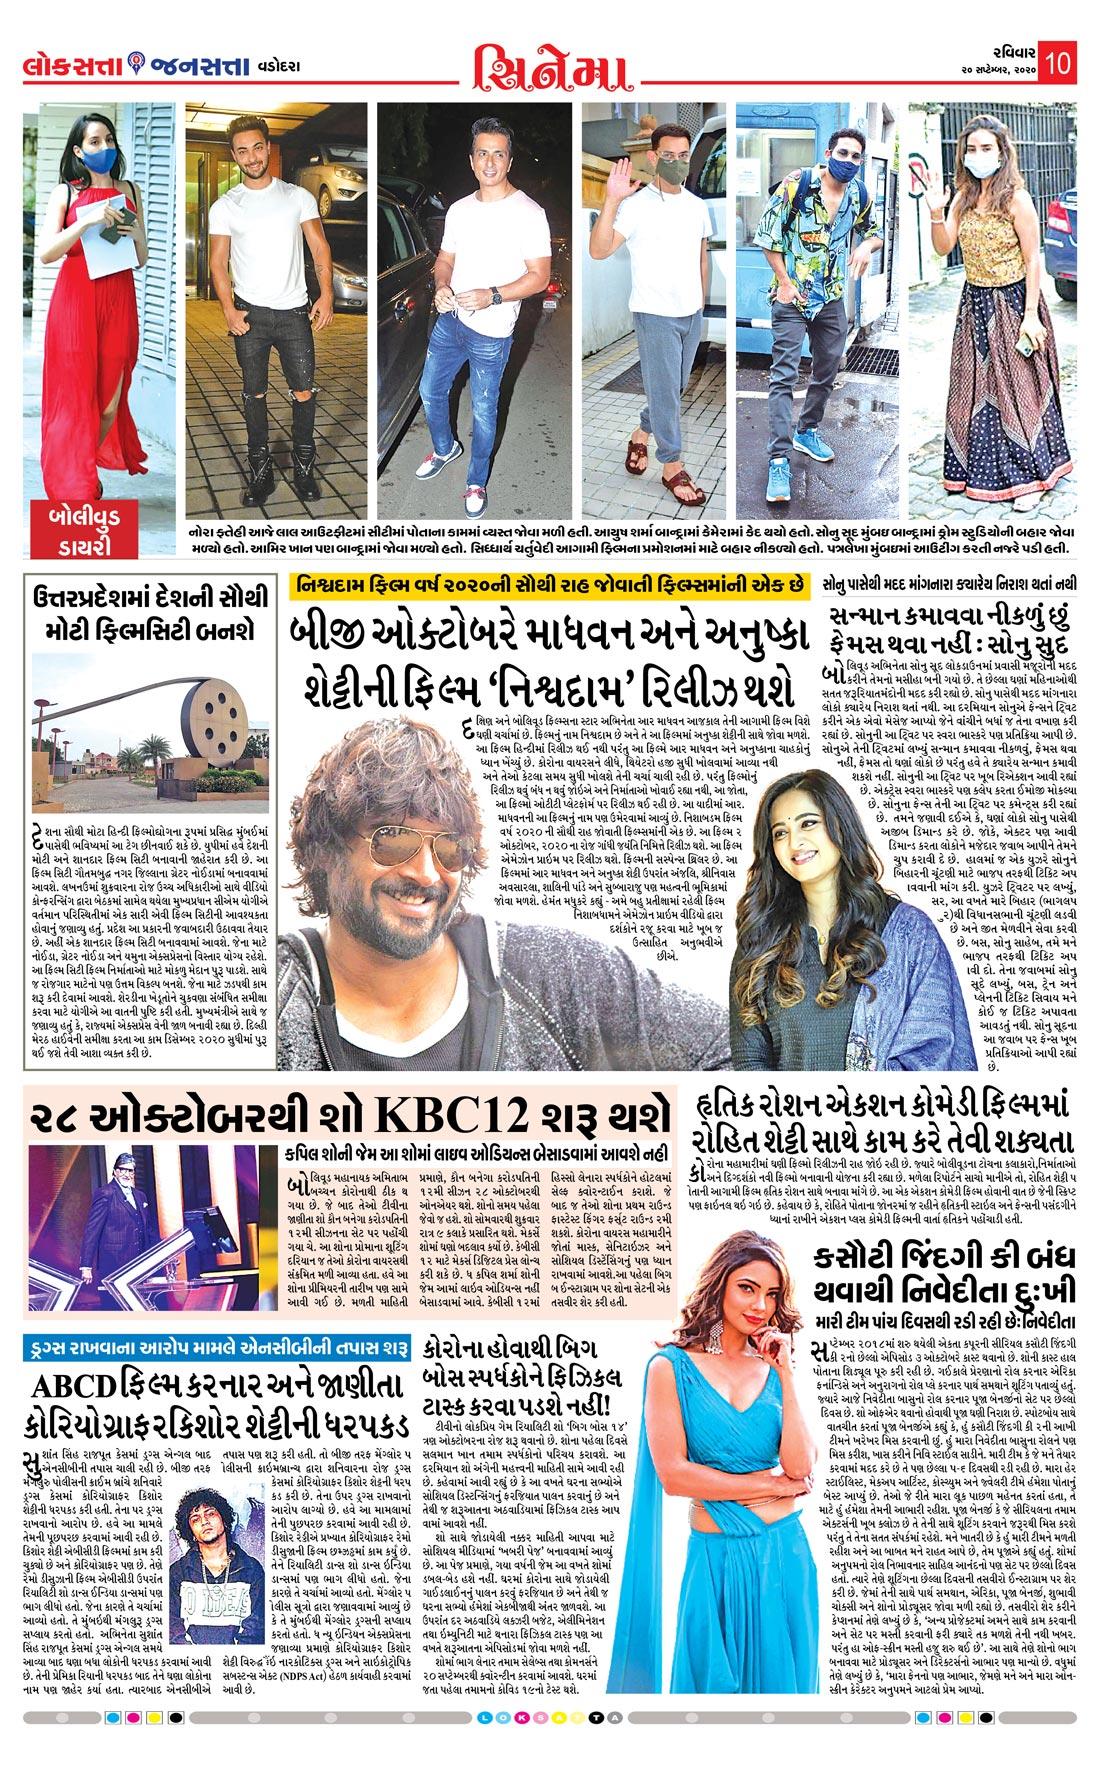 Loksatta Jansatta News Papaer E-paper dated 2020-09-20   Page 10